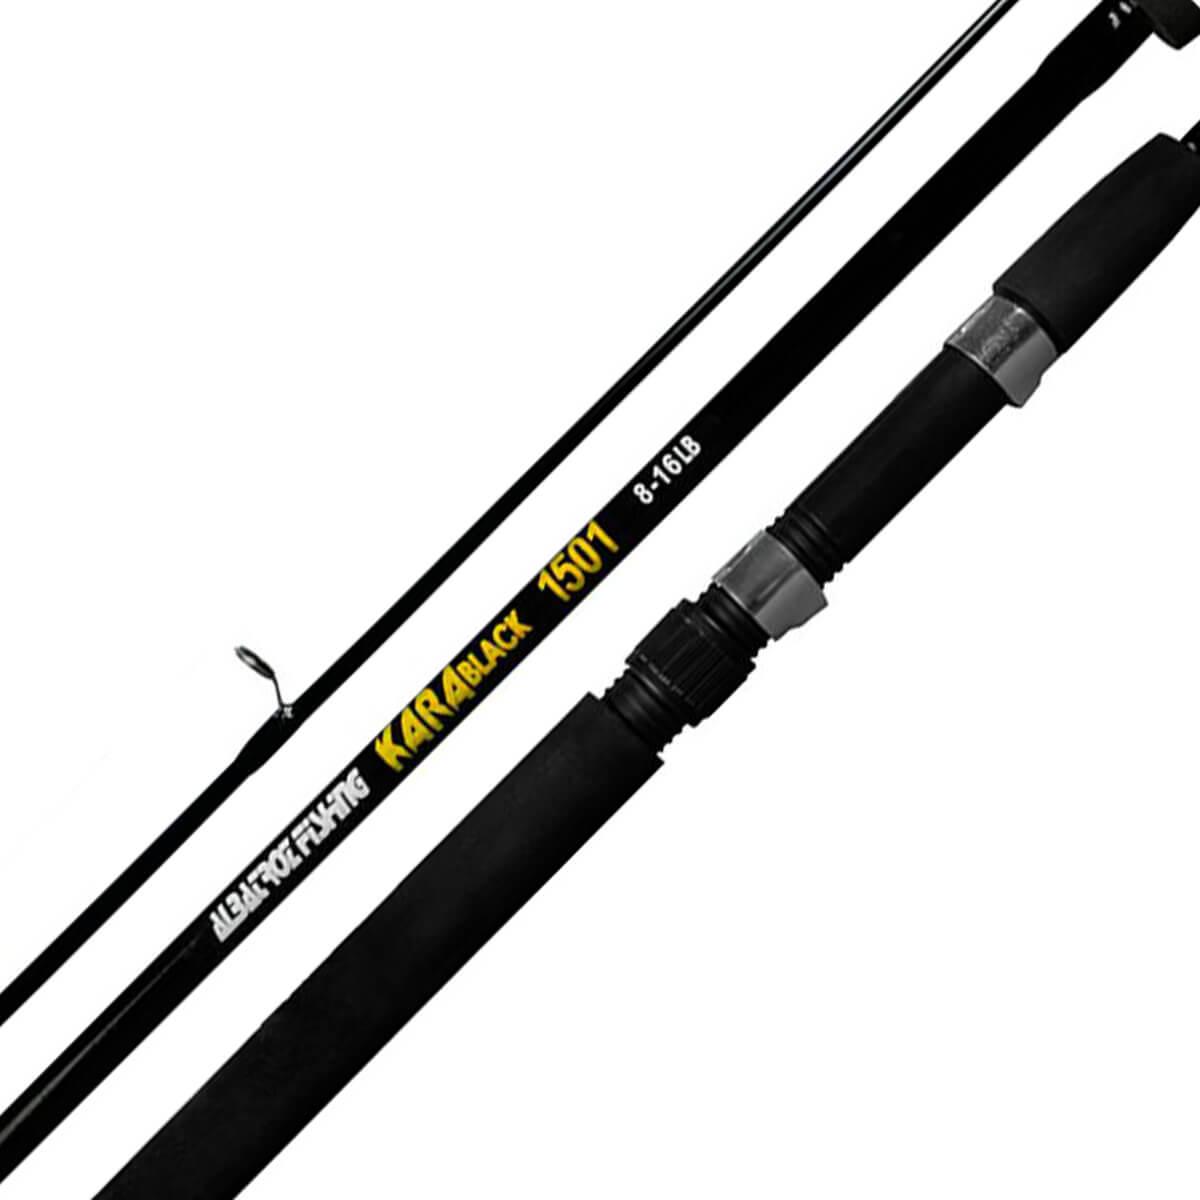 Vara Albatroz Kara Black p/ Molinete 1,50 m 16 Lbs (2 partes)  - Pró Pesca Shop